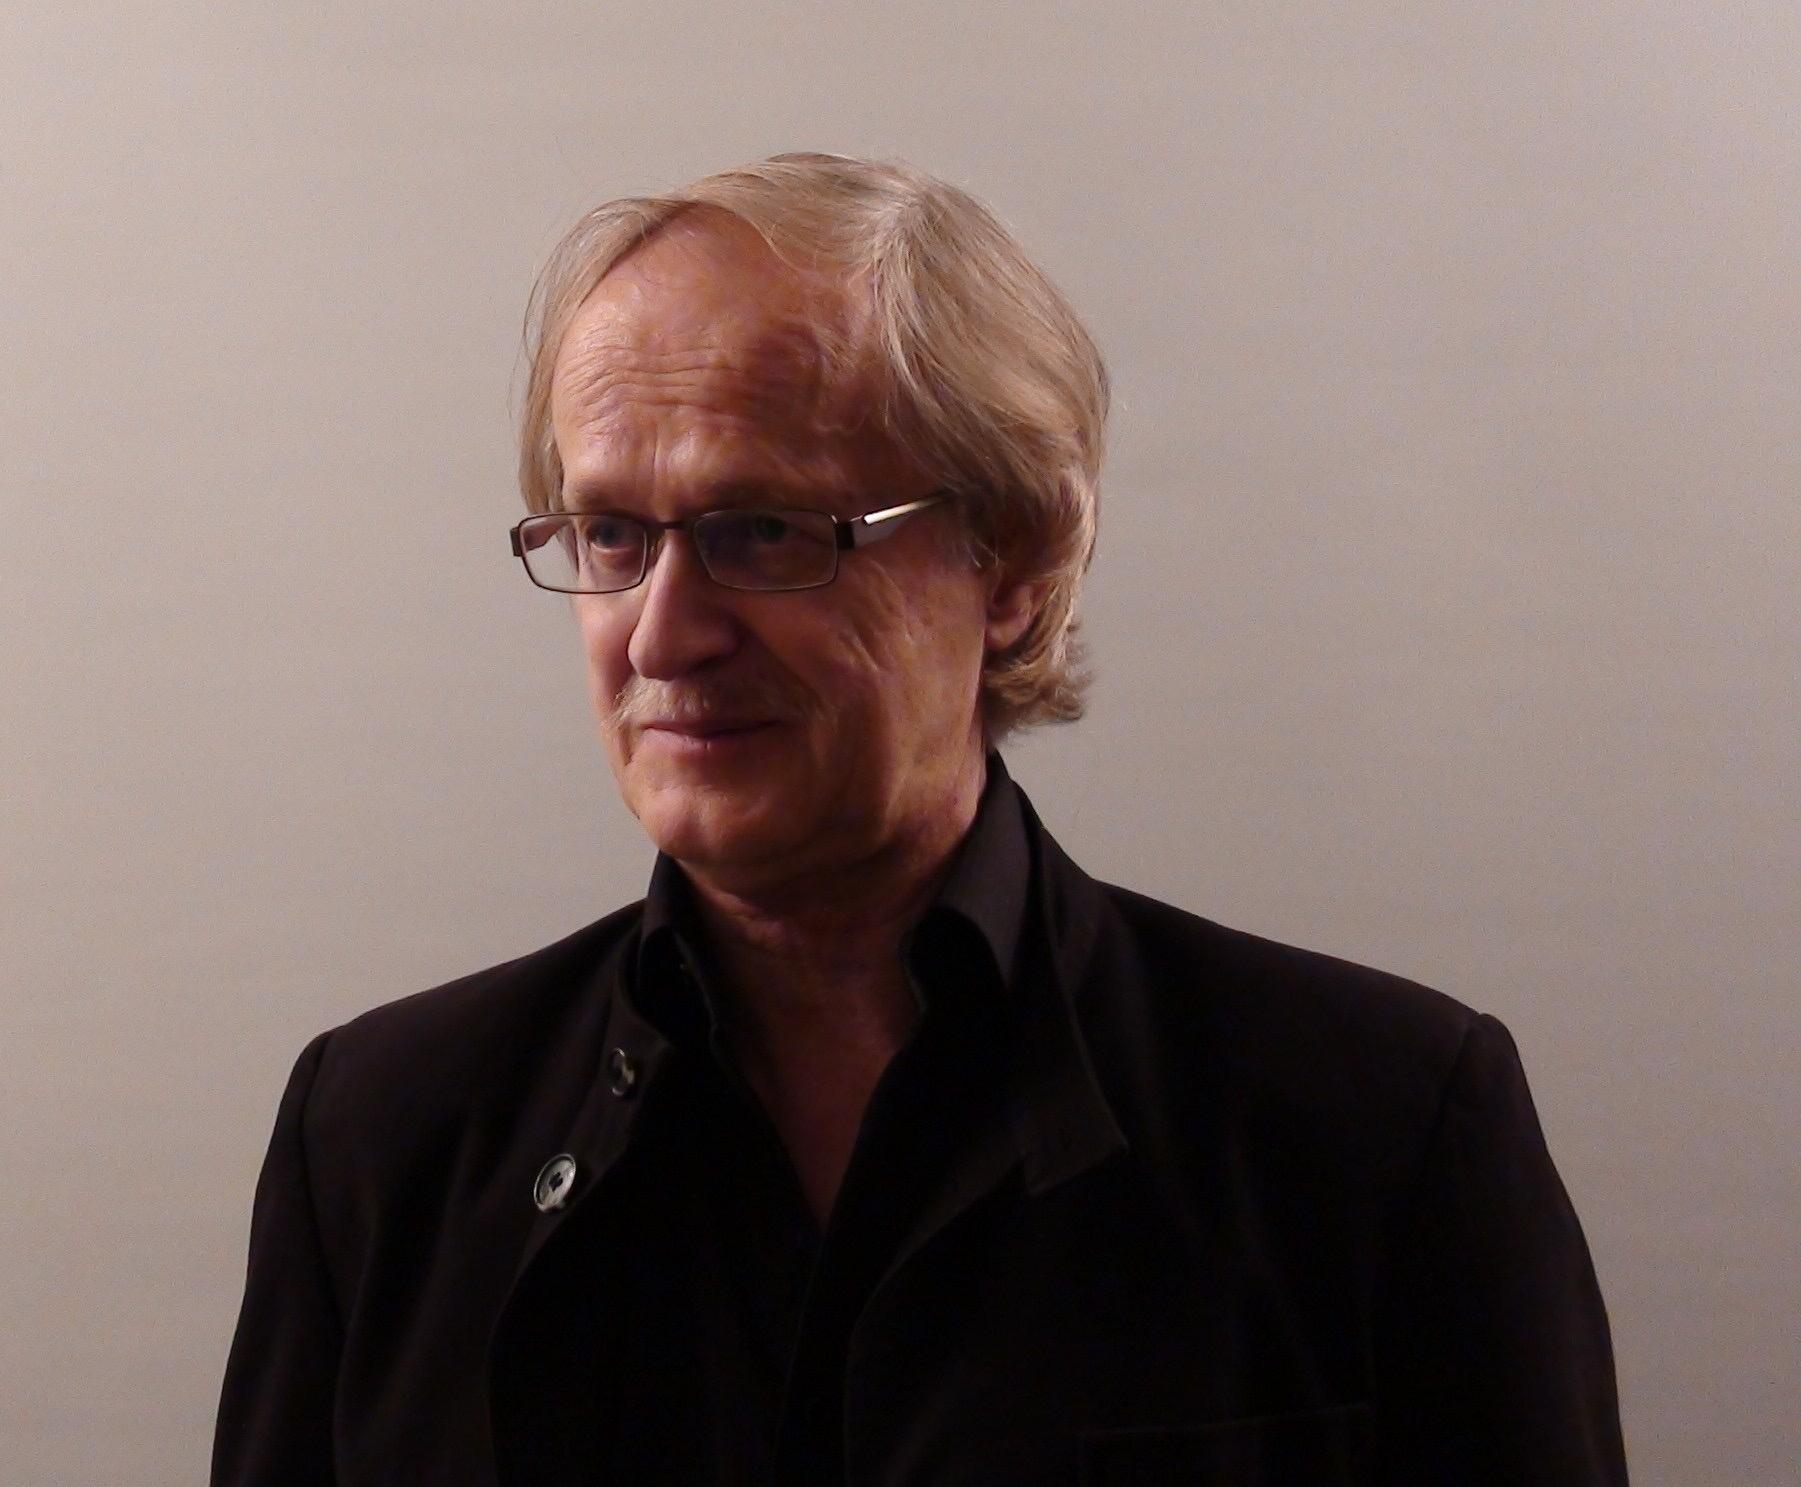 Brian Vass